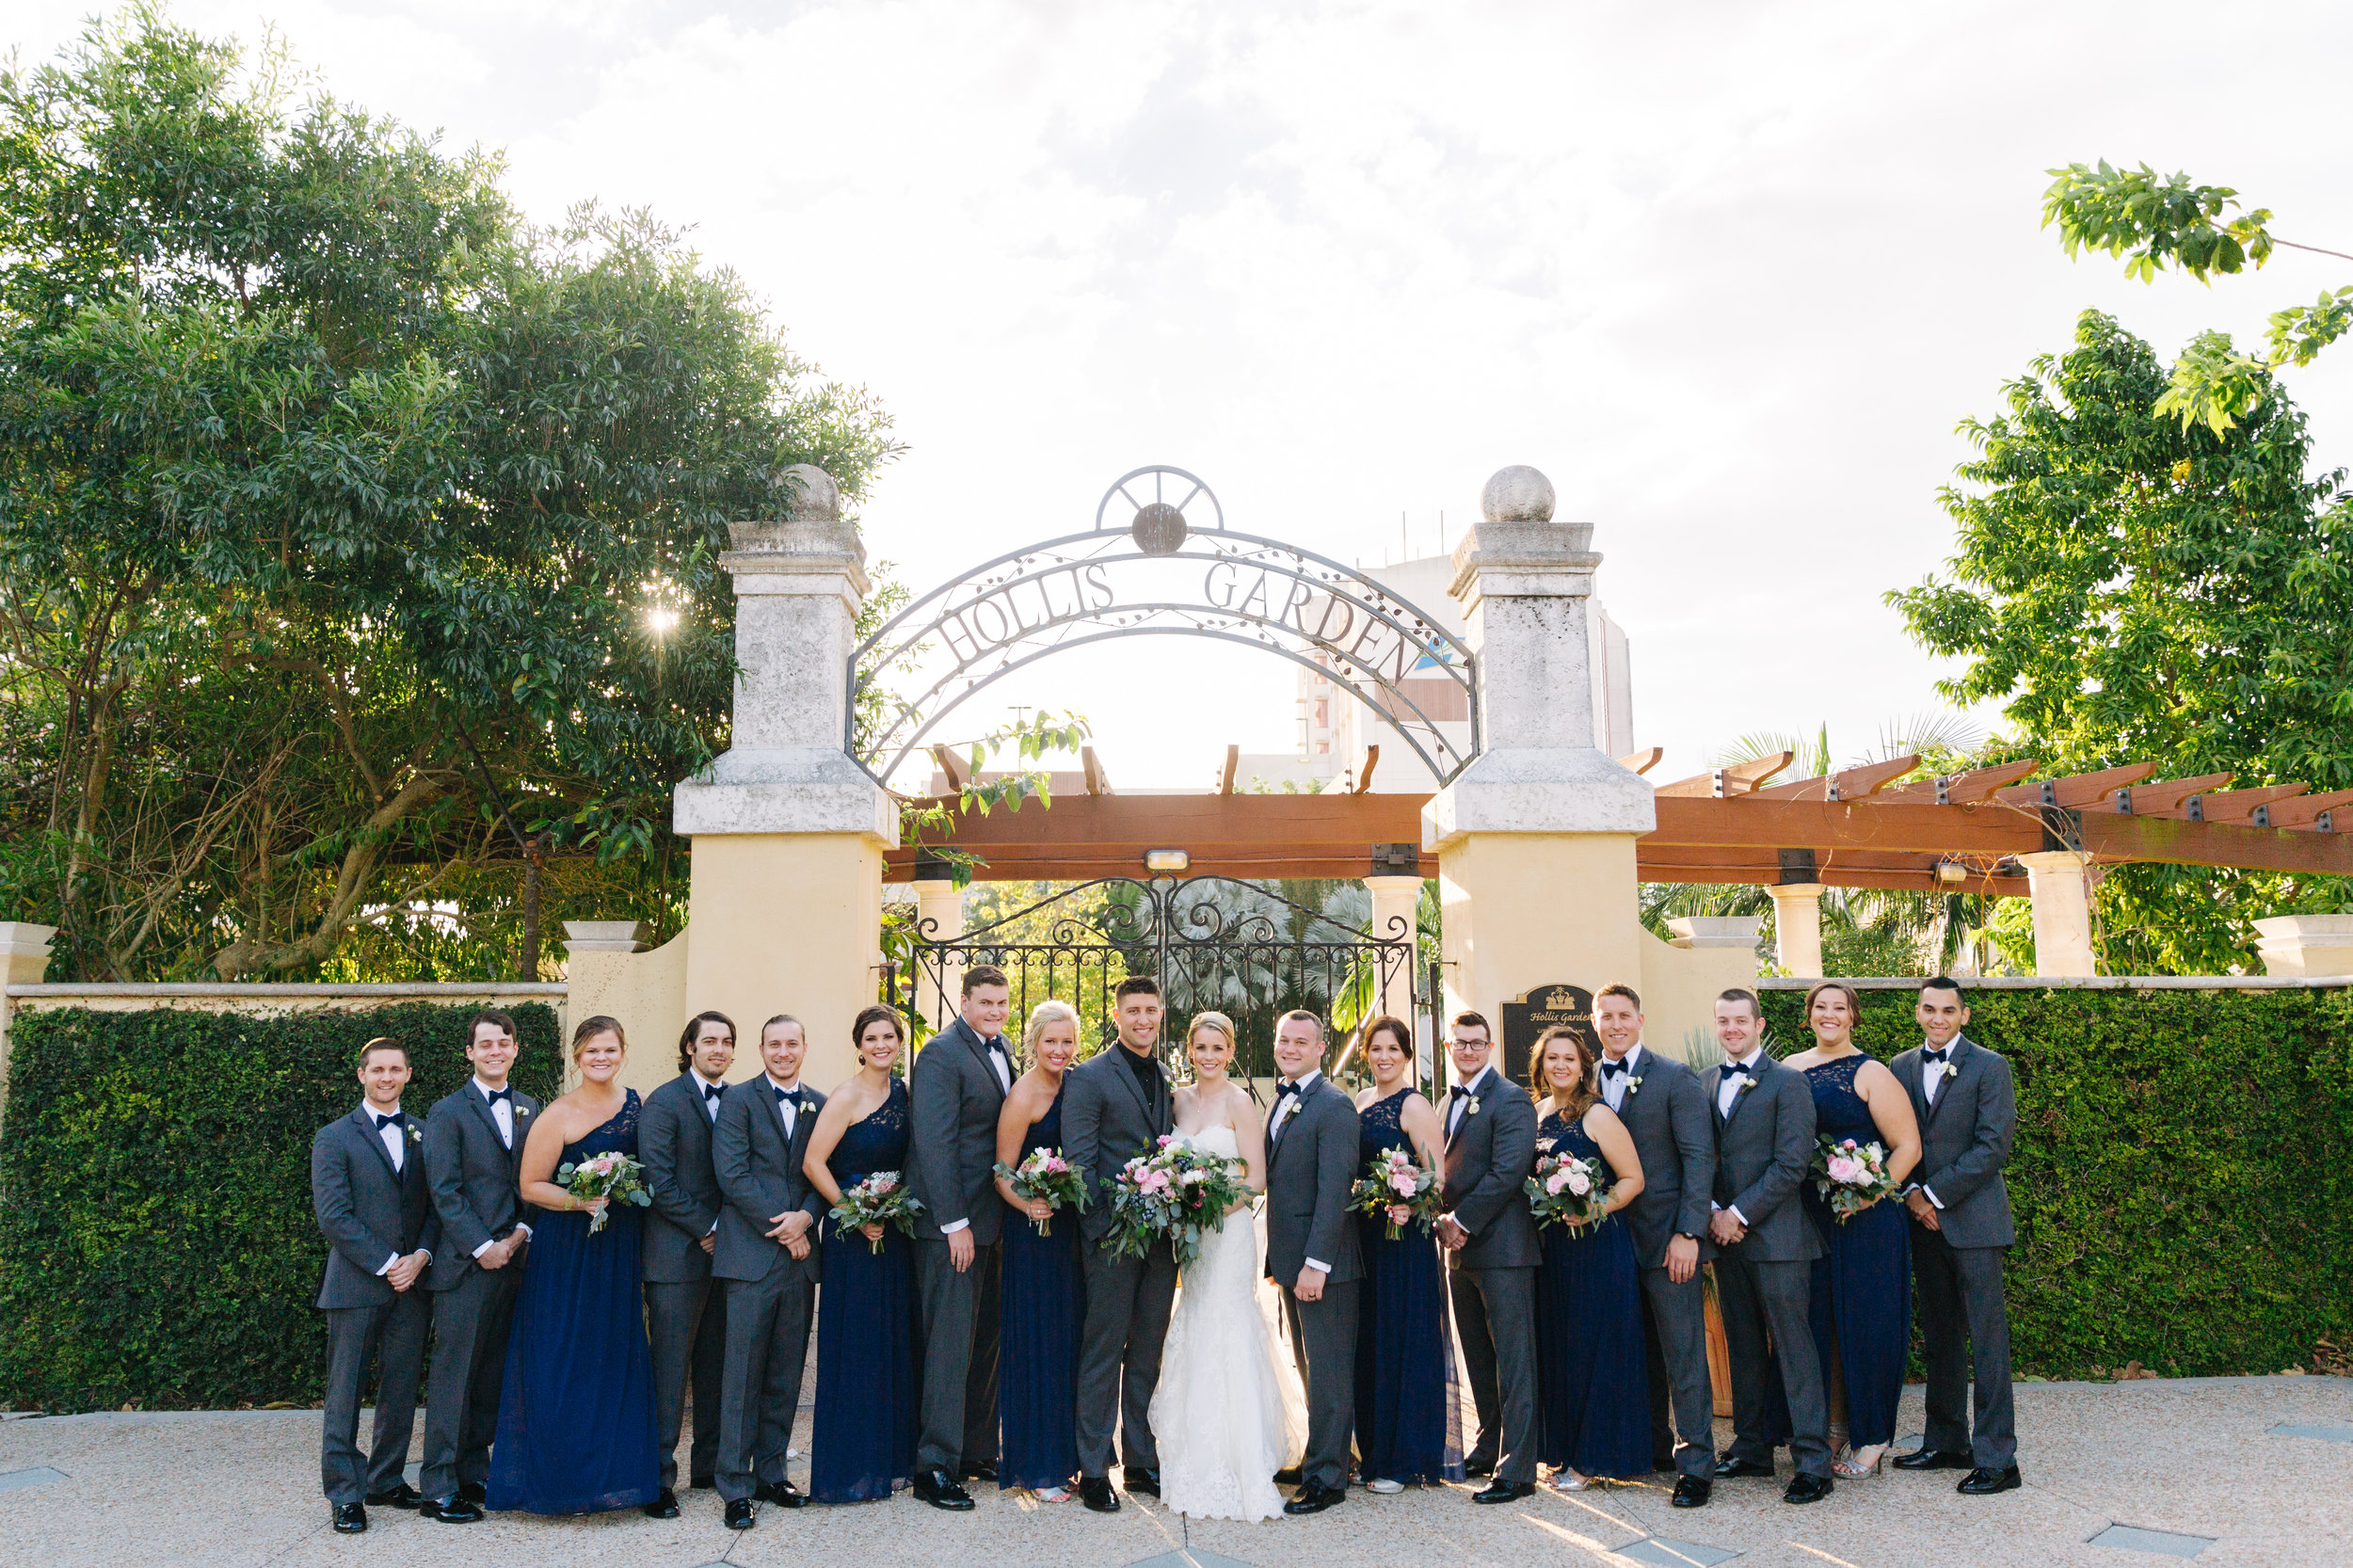 hollis gardens wedding downtown lakeland wedding jake and katie photography-26.jpg